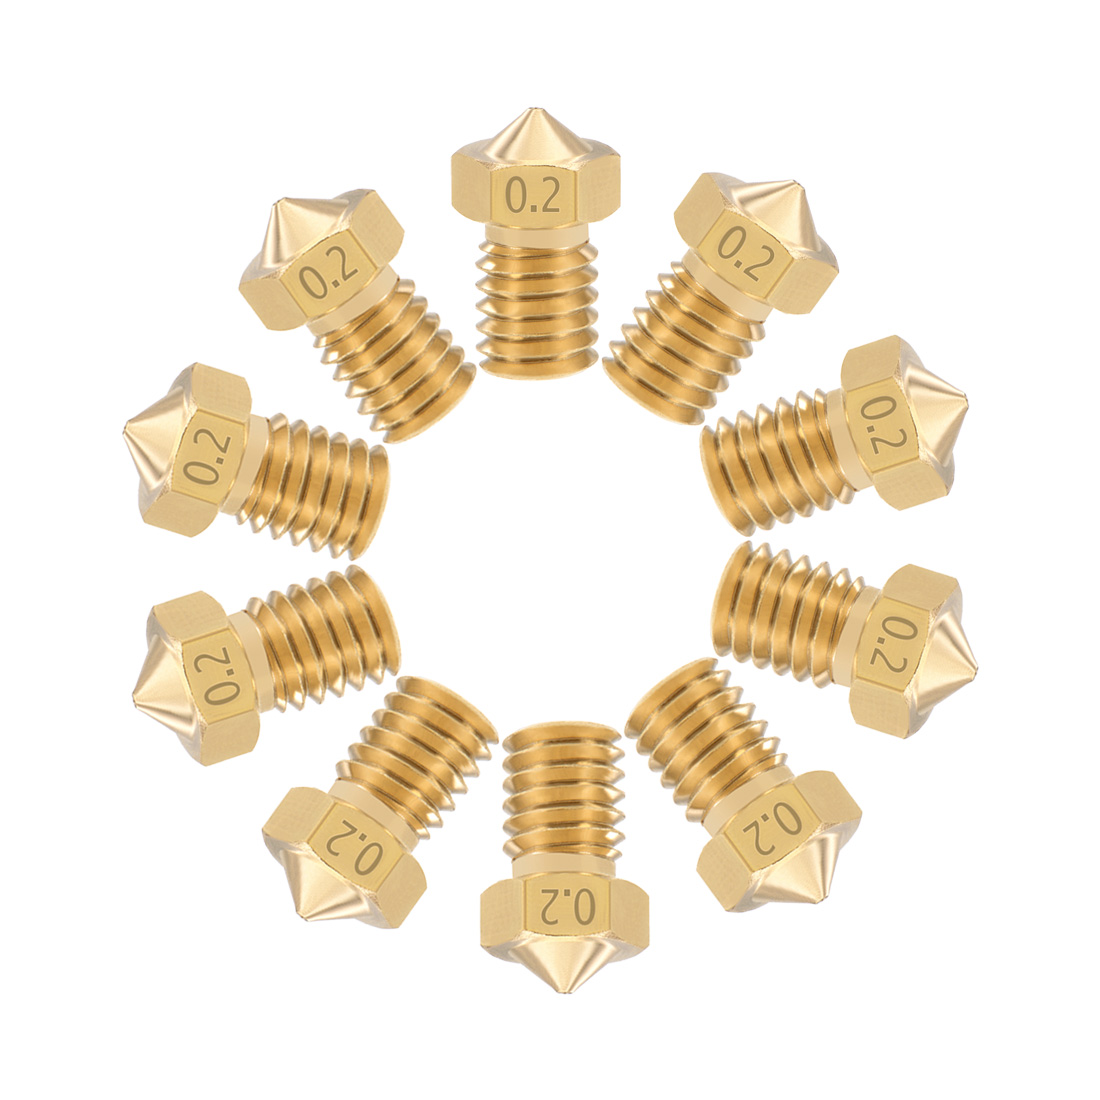 0.2mm 3D Printer Nozzle Head M6 Thread V5 V6 1.75mm Extruder Print Brass 10pcs